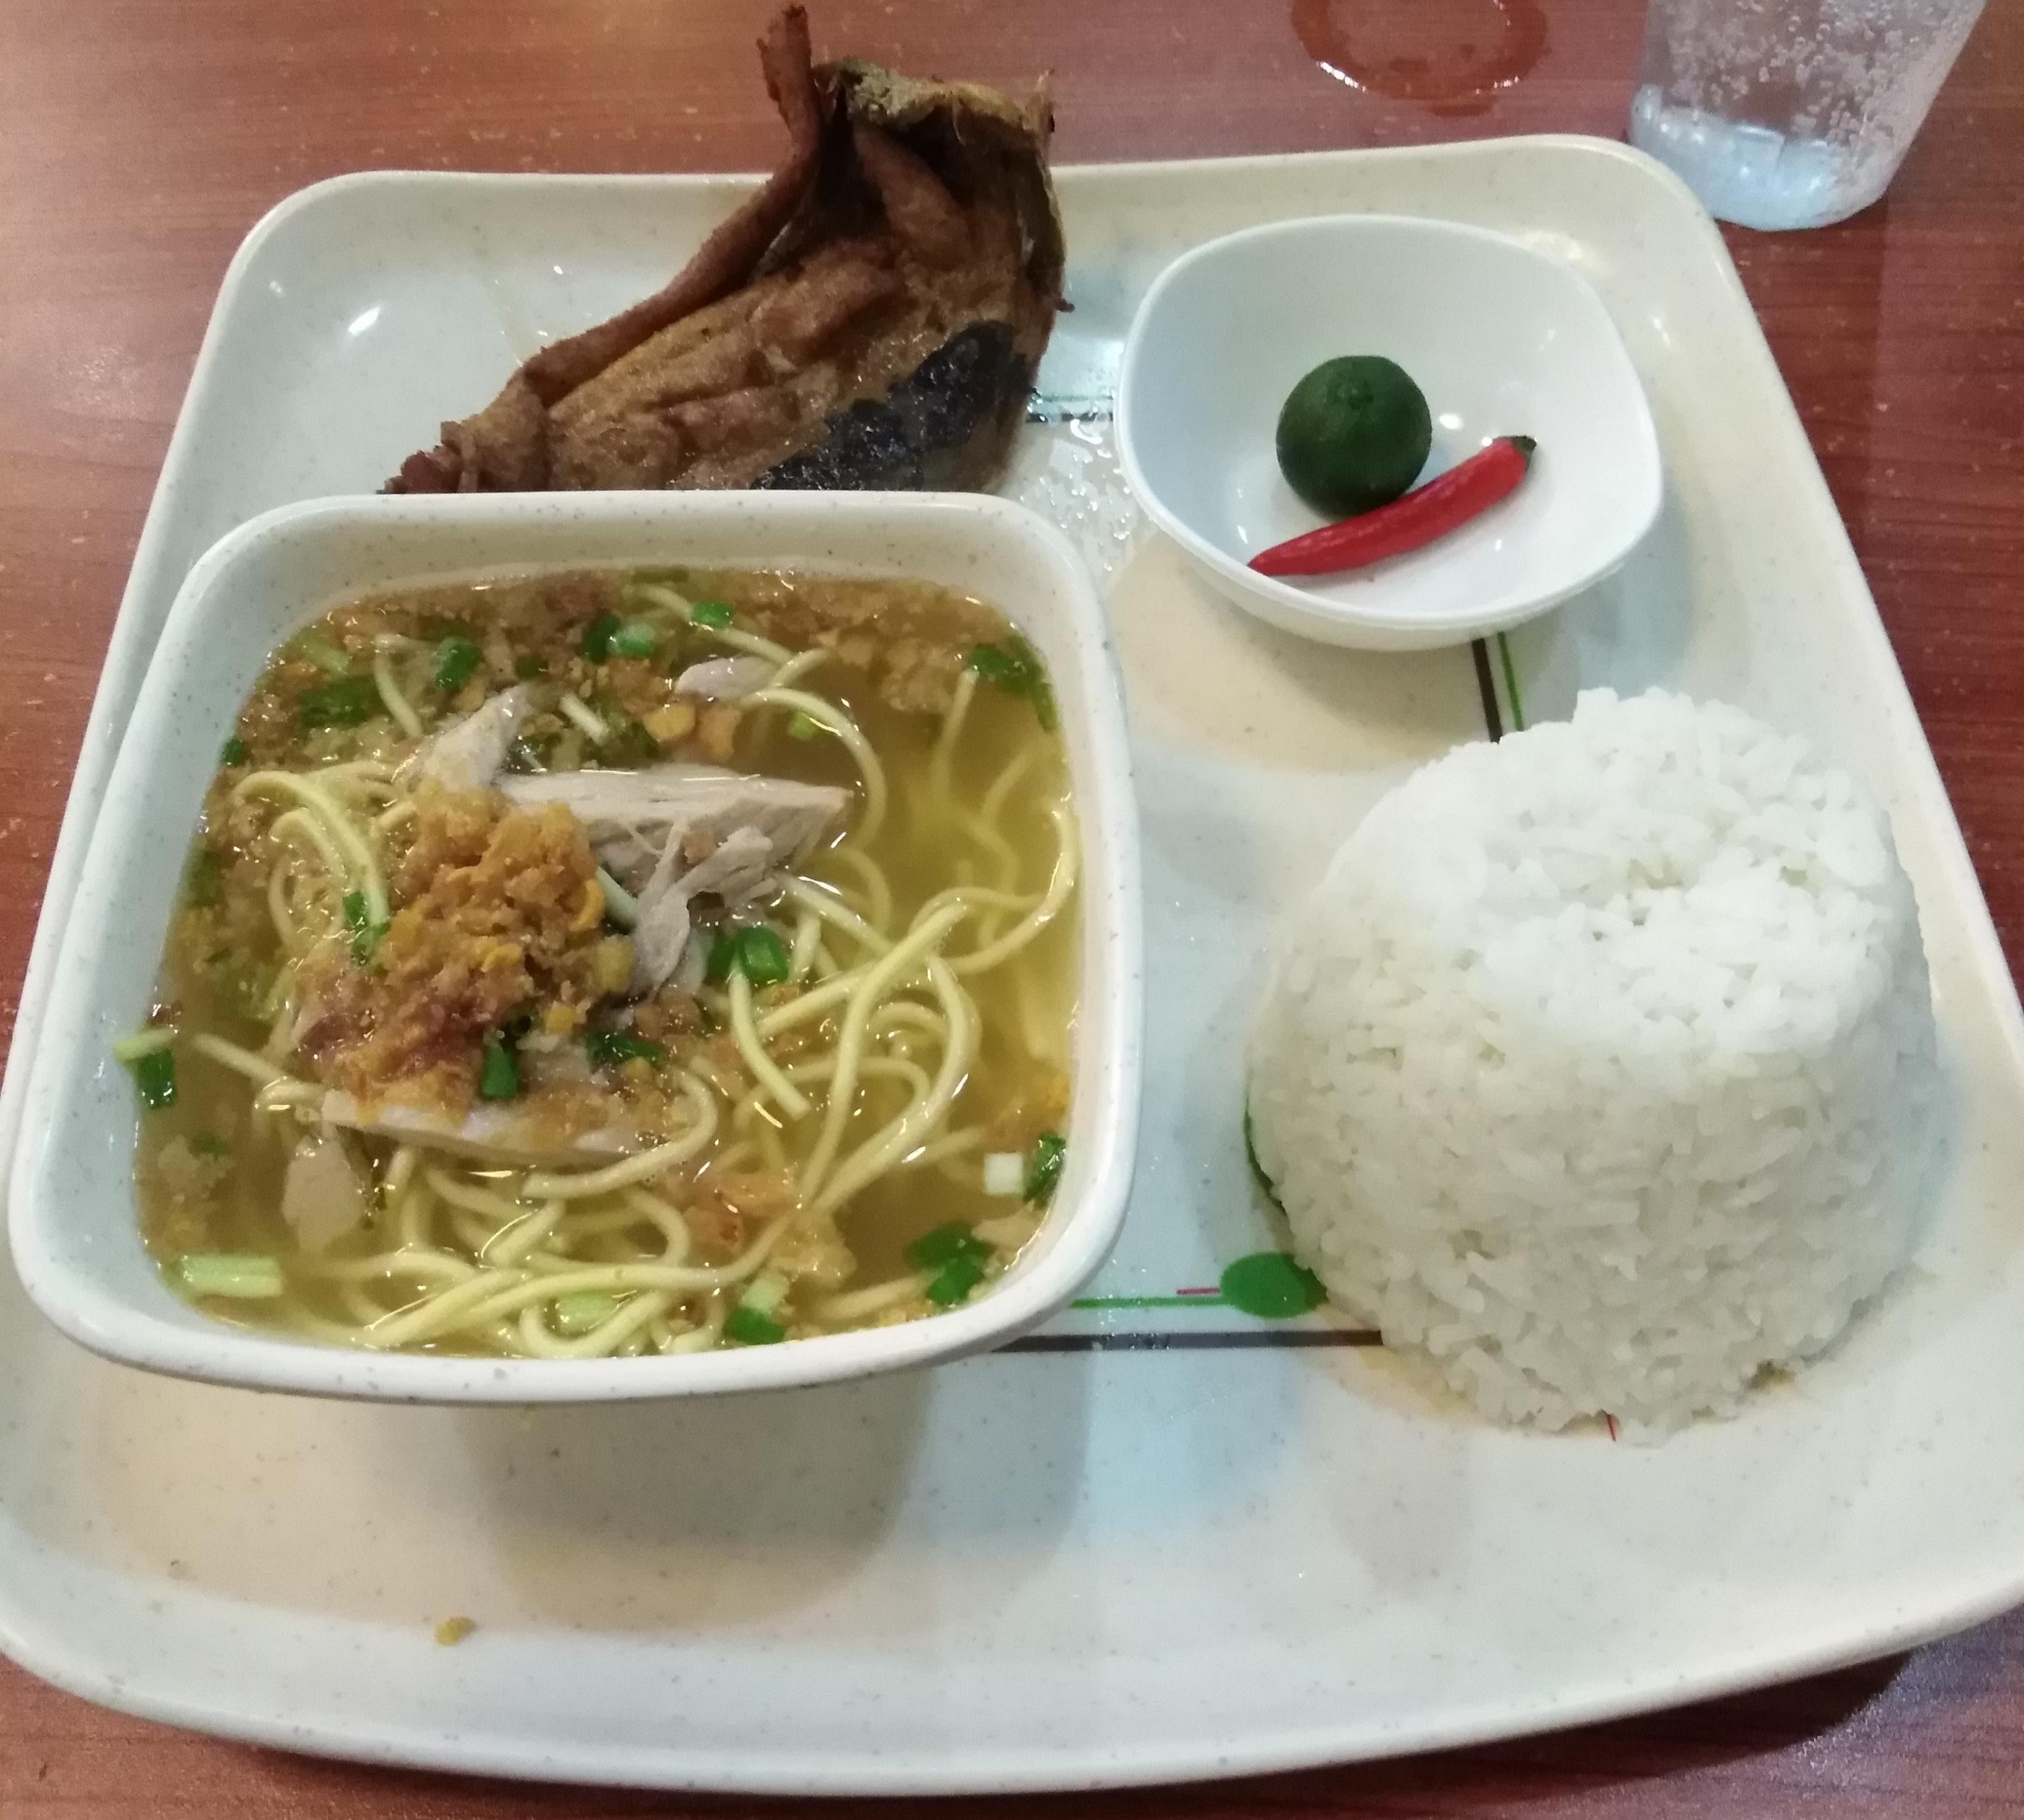 Bangus Namit Meal by Ted's Oldtimer La Paz Batchoy